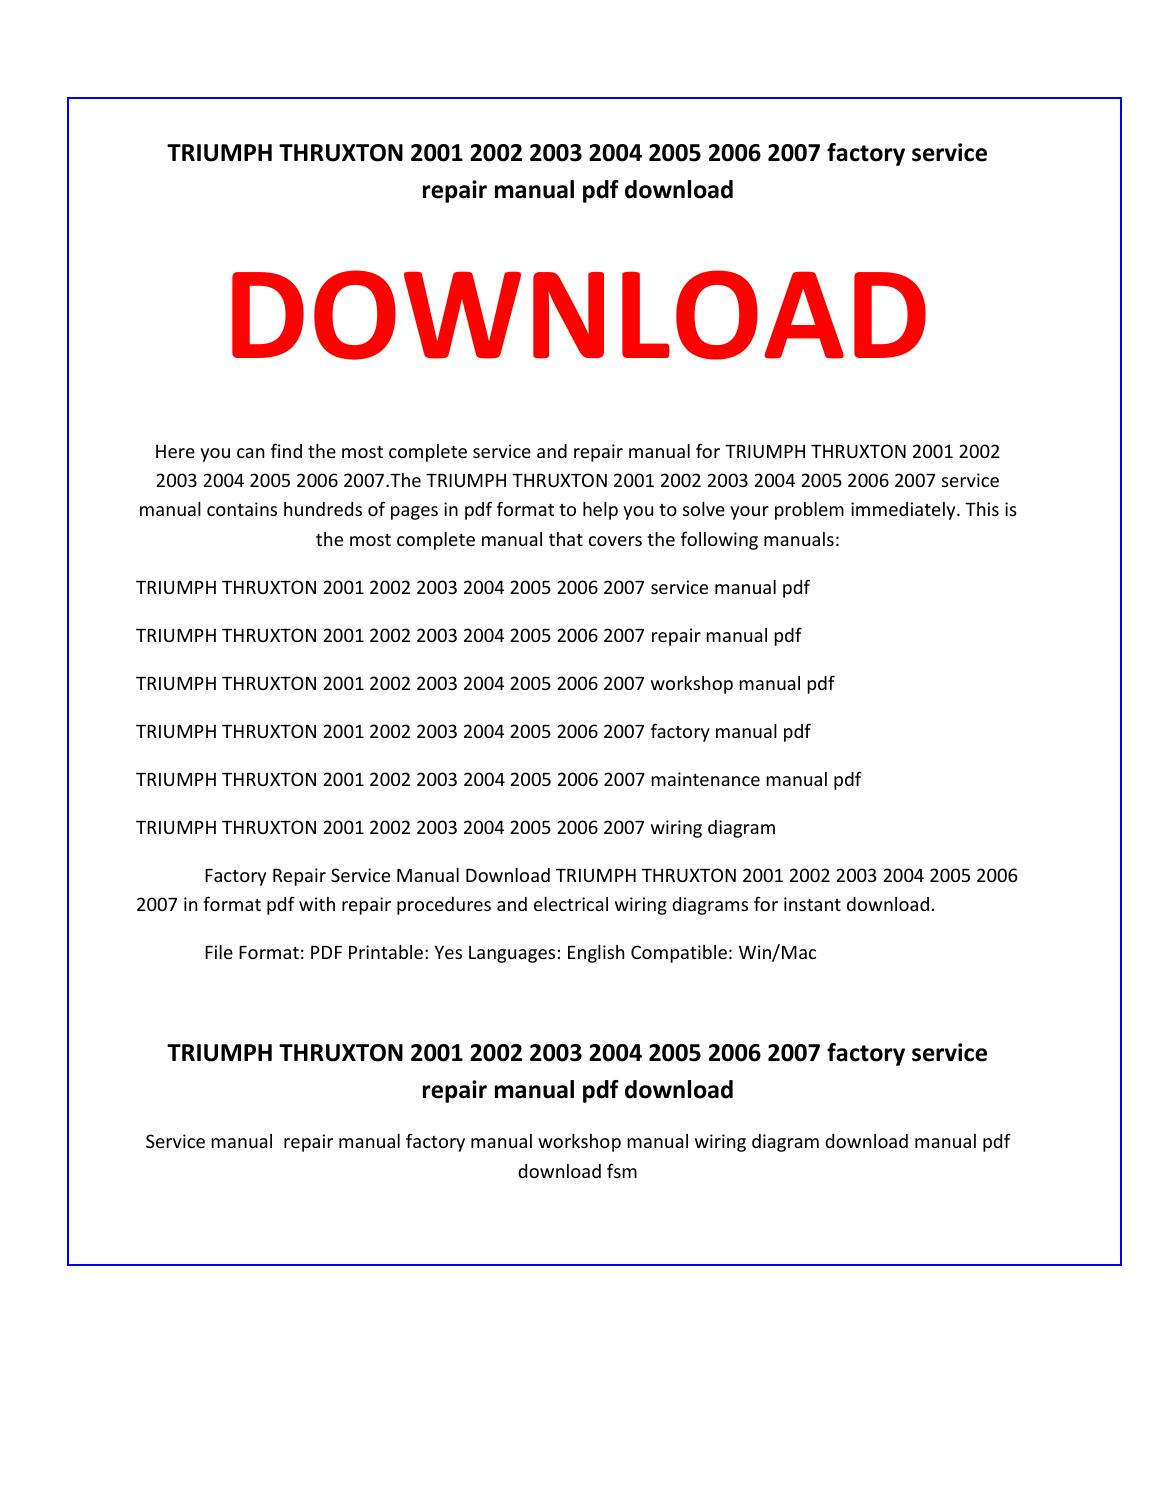 Triumph Thruxton 2001 2002 2003 2004 2005 2006 2007